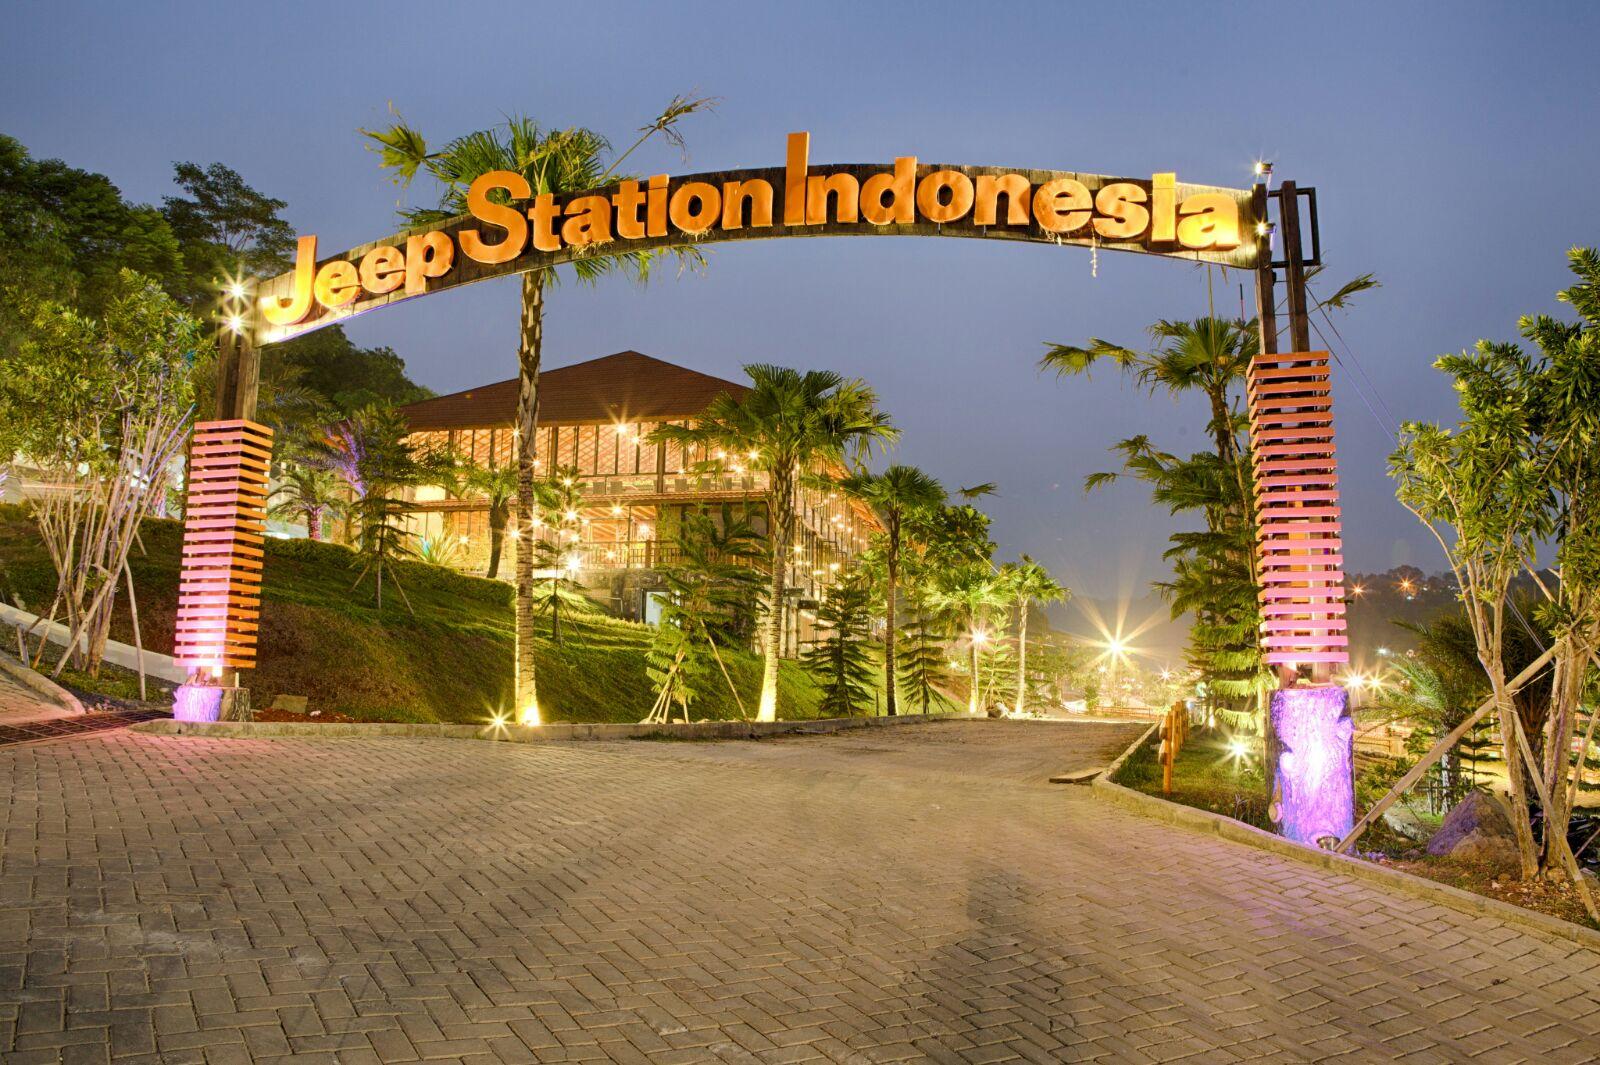 Jeep Station Indonesia Jeep Station Indonesia Hotelnya Penggila